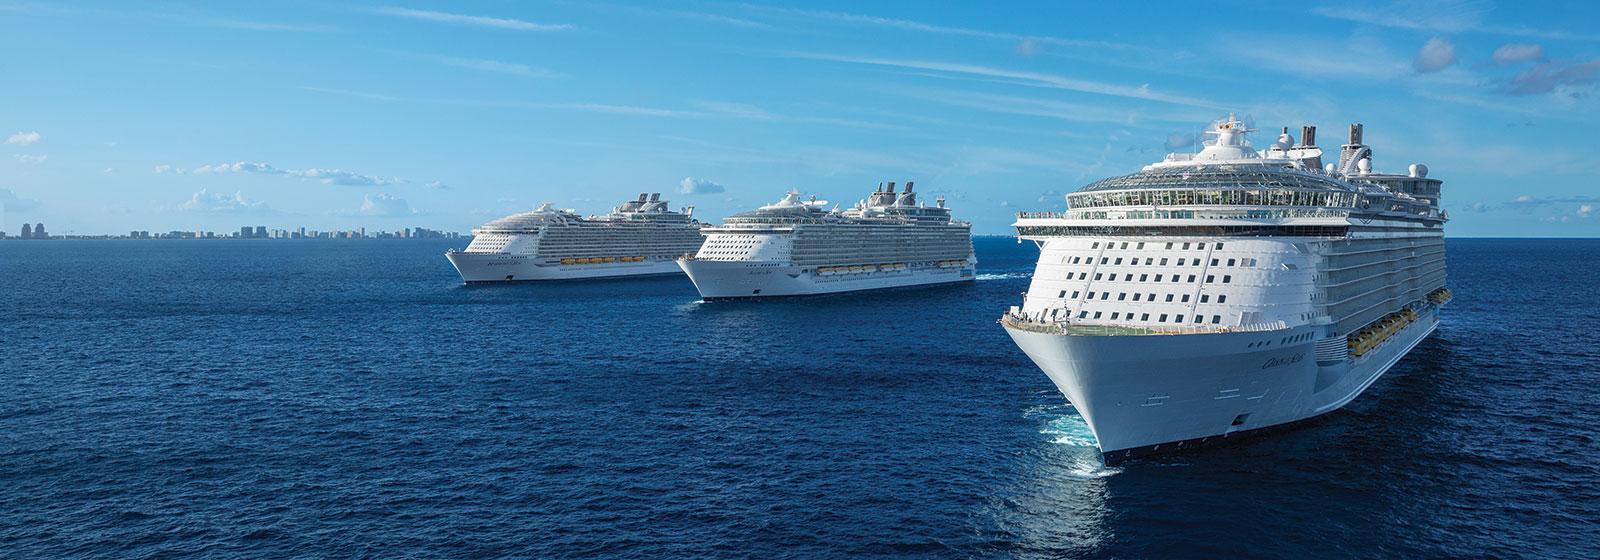 Royal Caribbean 3 Sisters